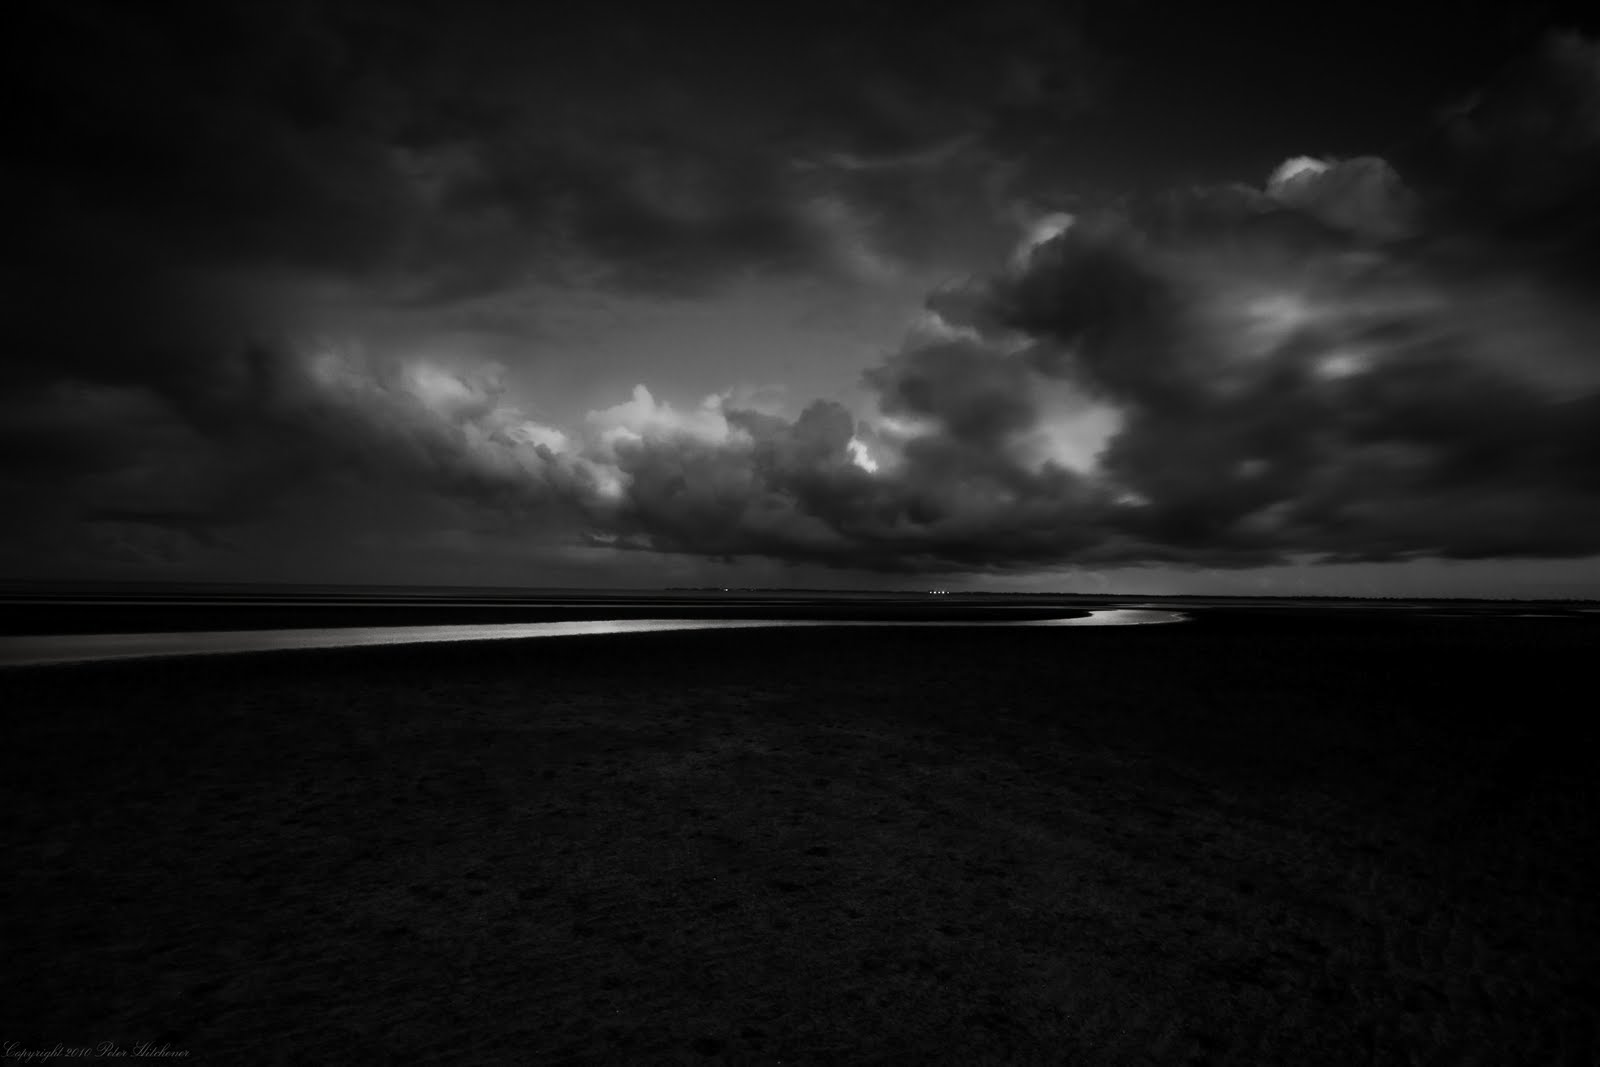 http://4.bp.blogspot.com/-op3FwCvNQ9s/TkW__Y6UKAI/AAAAAAAAATc/pLrdWZF8vQg/s1600/Dark+Soul+Cloudsjpg.jpg